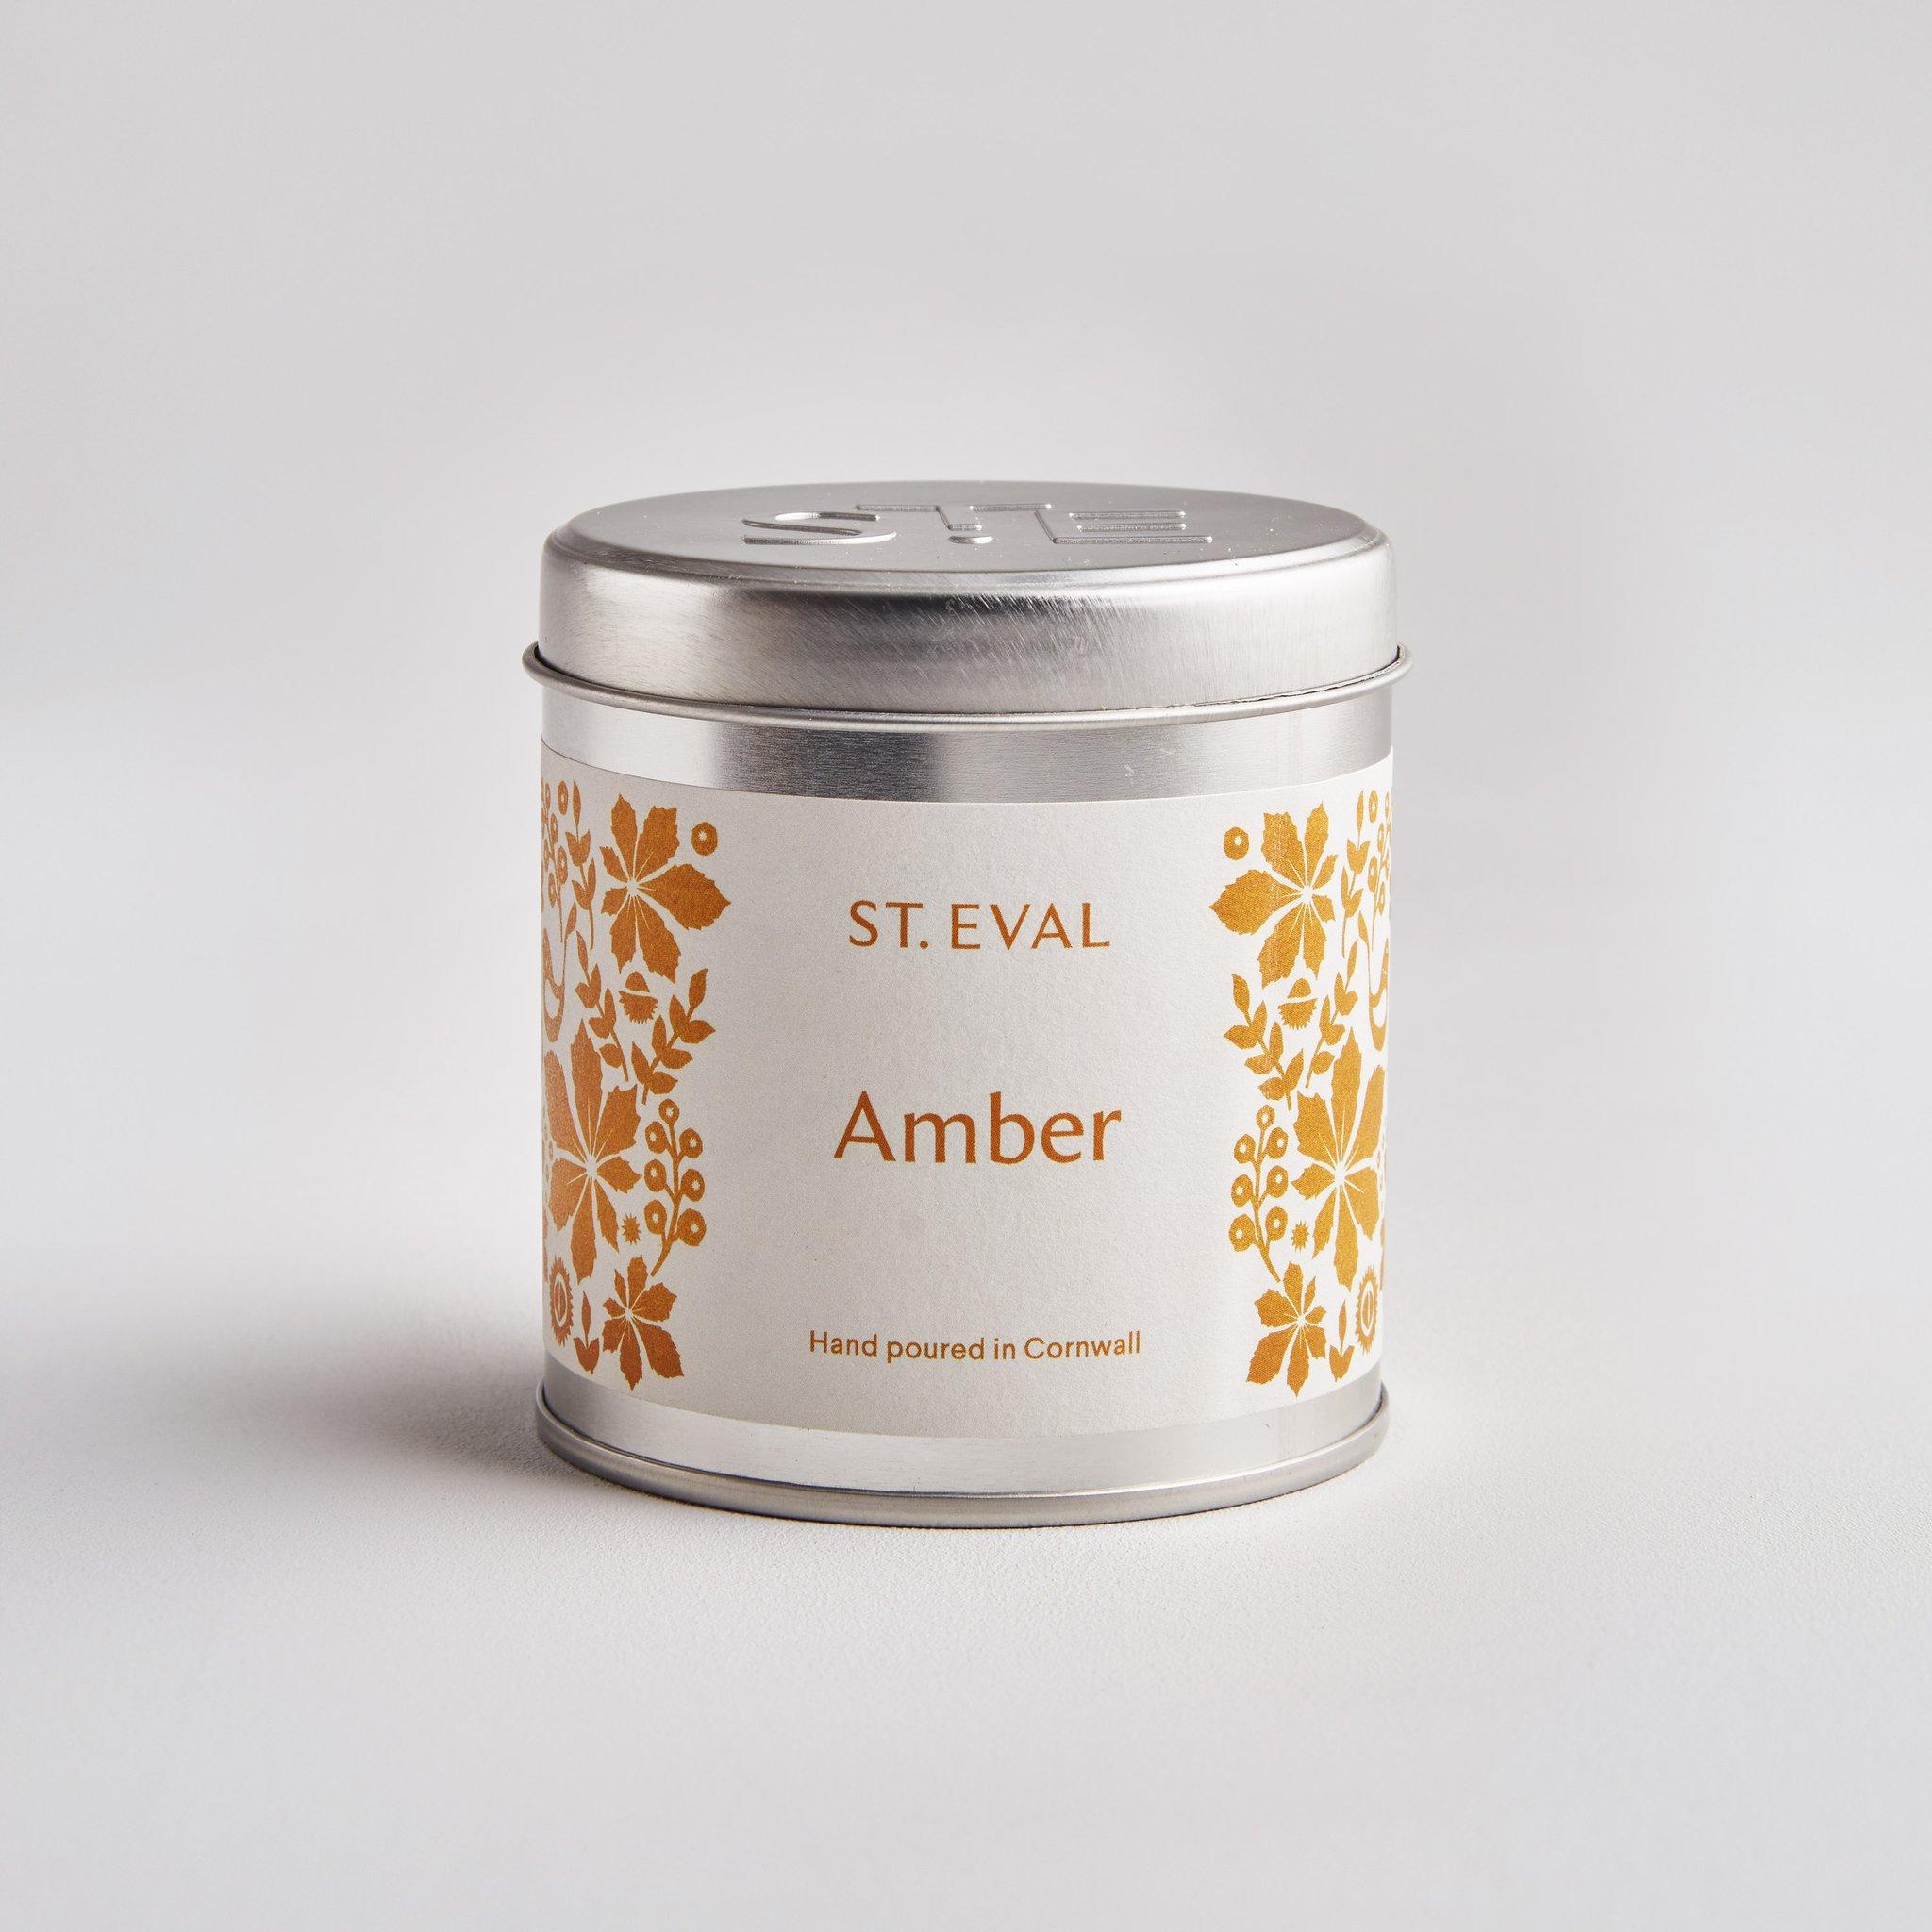 St Eval Folk Candle Tin - Amber